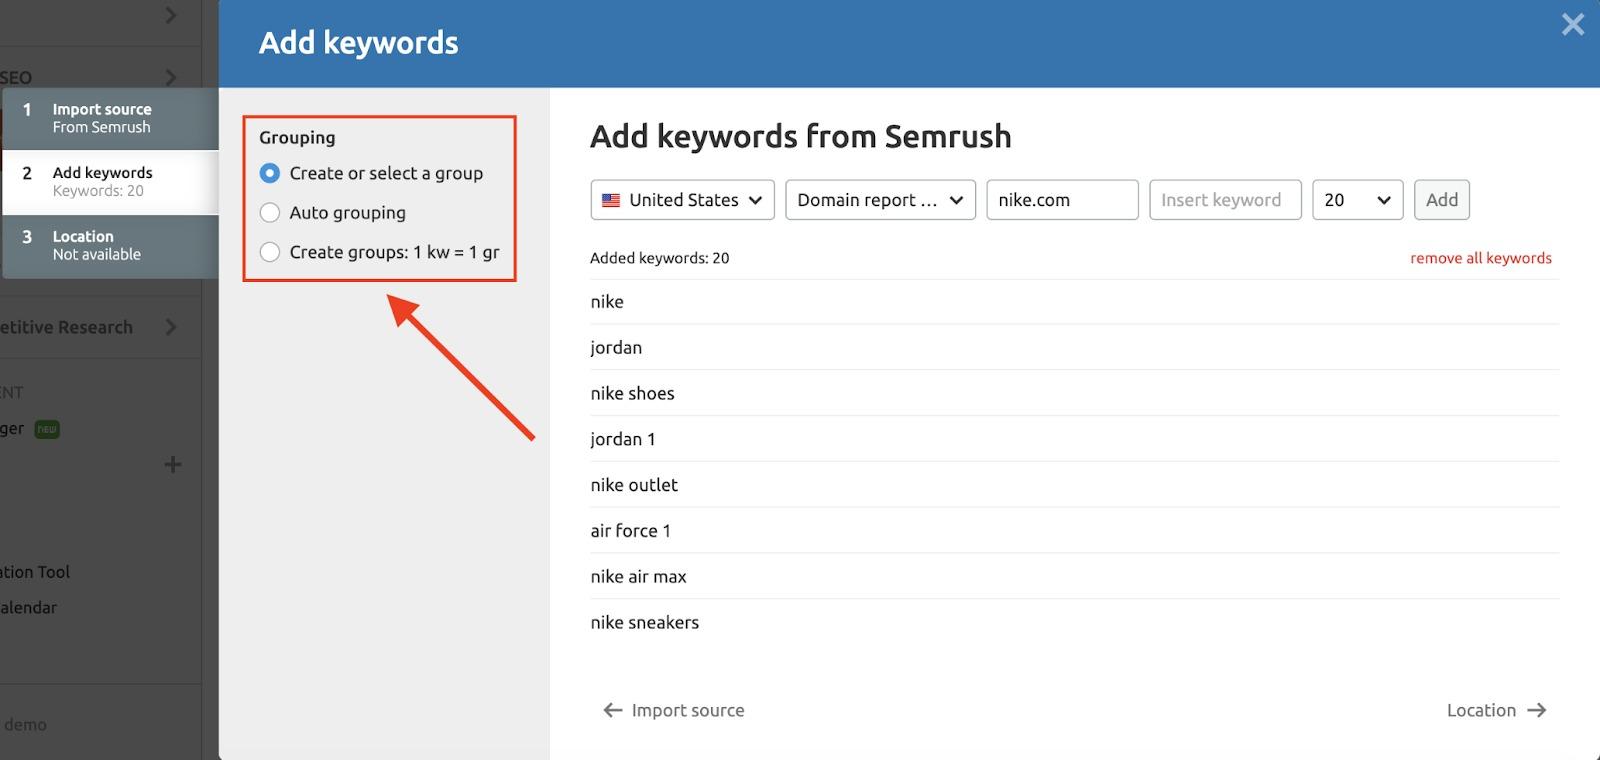 Configuring the PPC Keyword Tool image 4